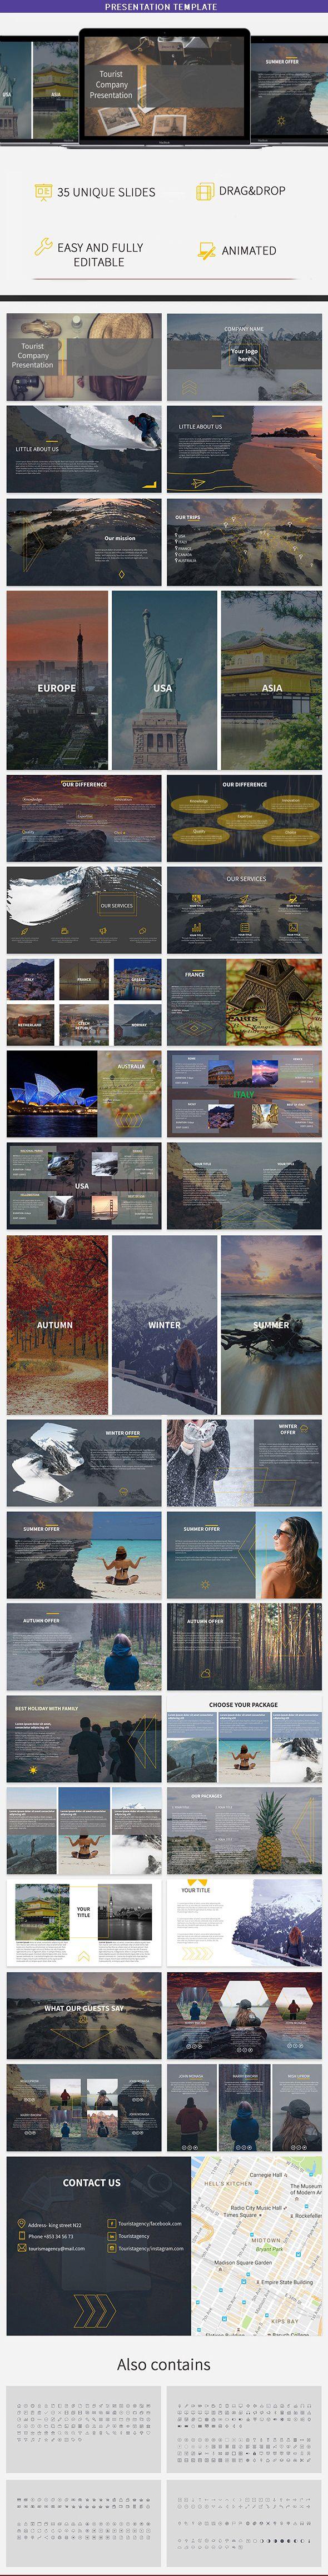 Tourist Company PowerPoint Presentation Template